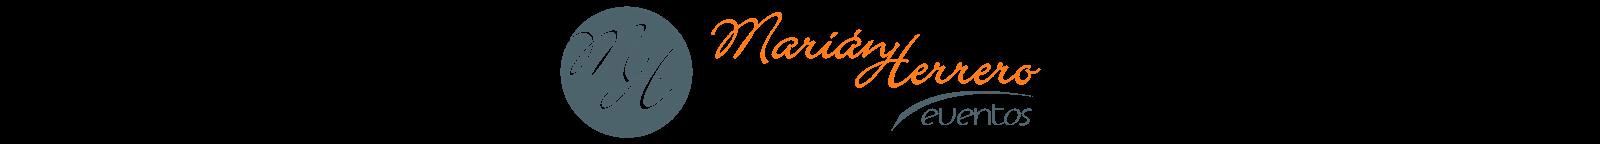 Marián Herrero Eventos